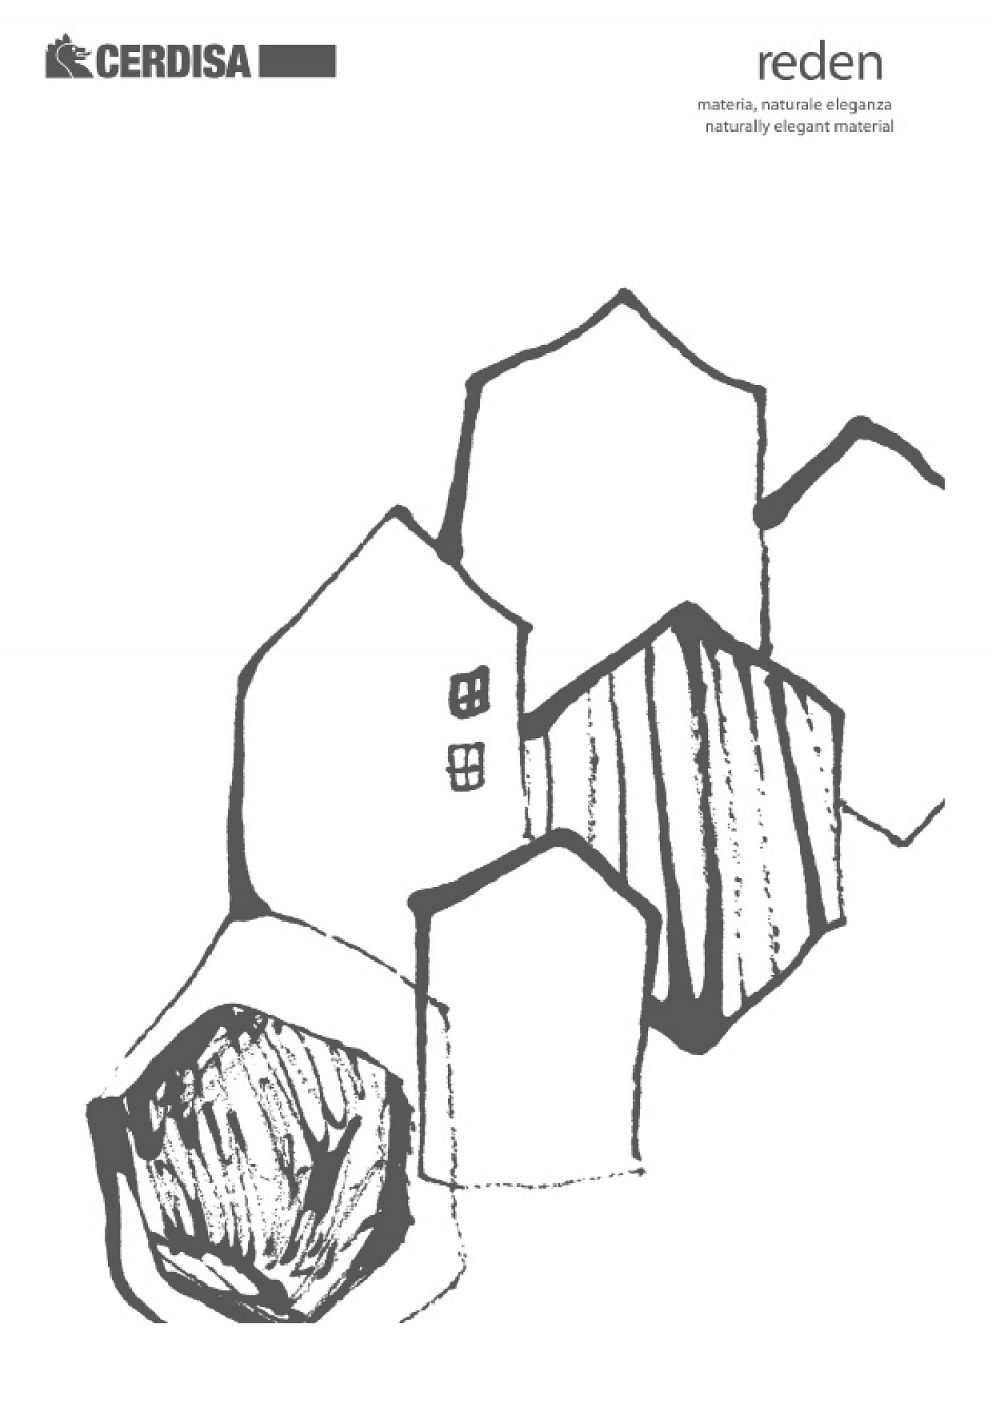 Cerdisa - Reden